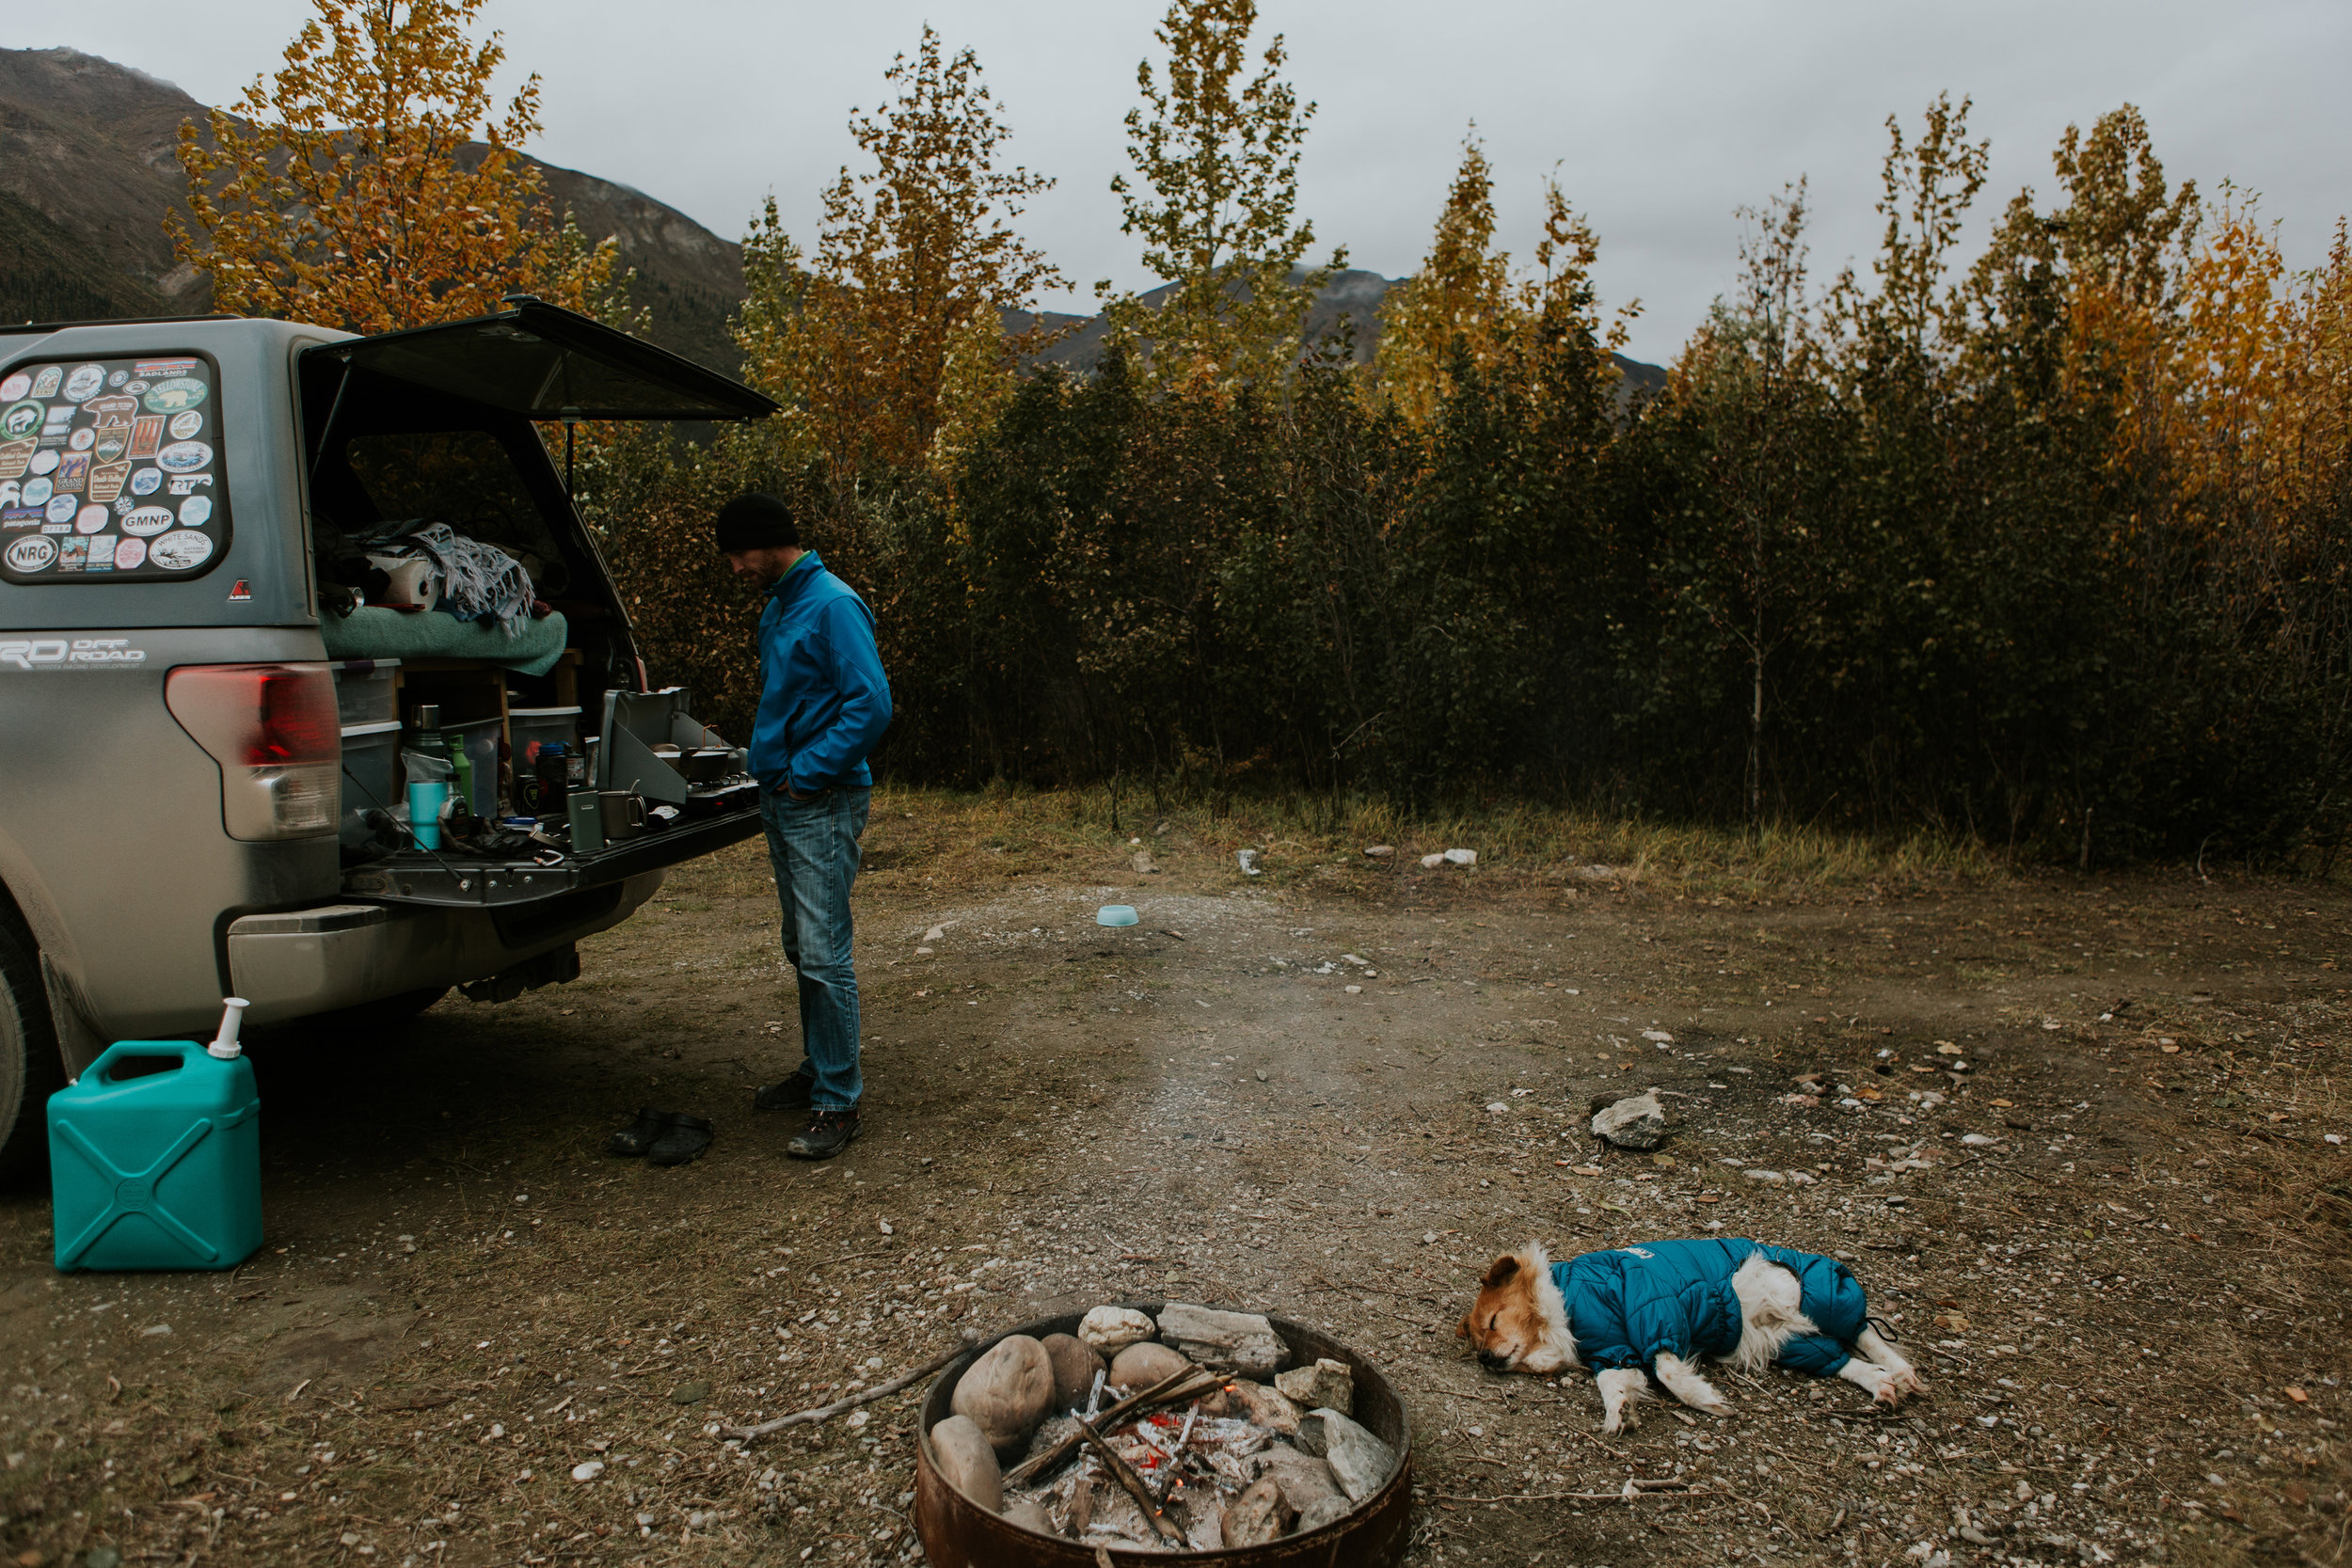 CindyGiovagnoli_Alaska_KoyukukRiver_SukakpakMountain_JimRiver_ArcticCircle_fly_fishing_September-013.jpg